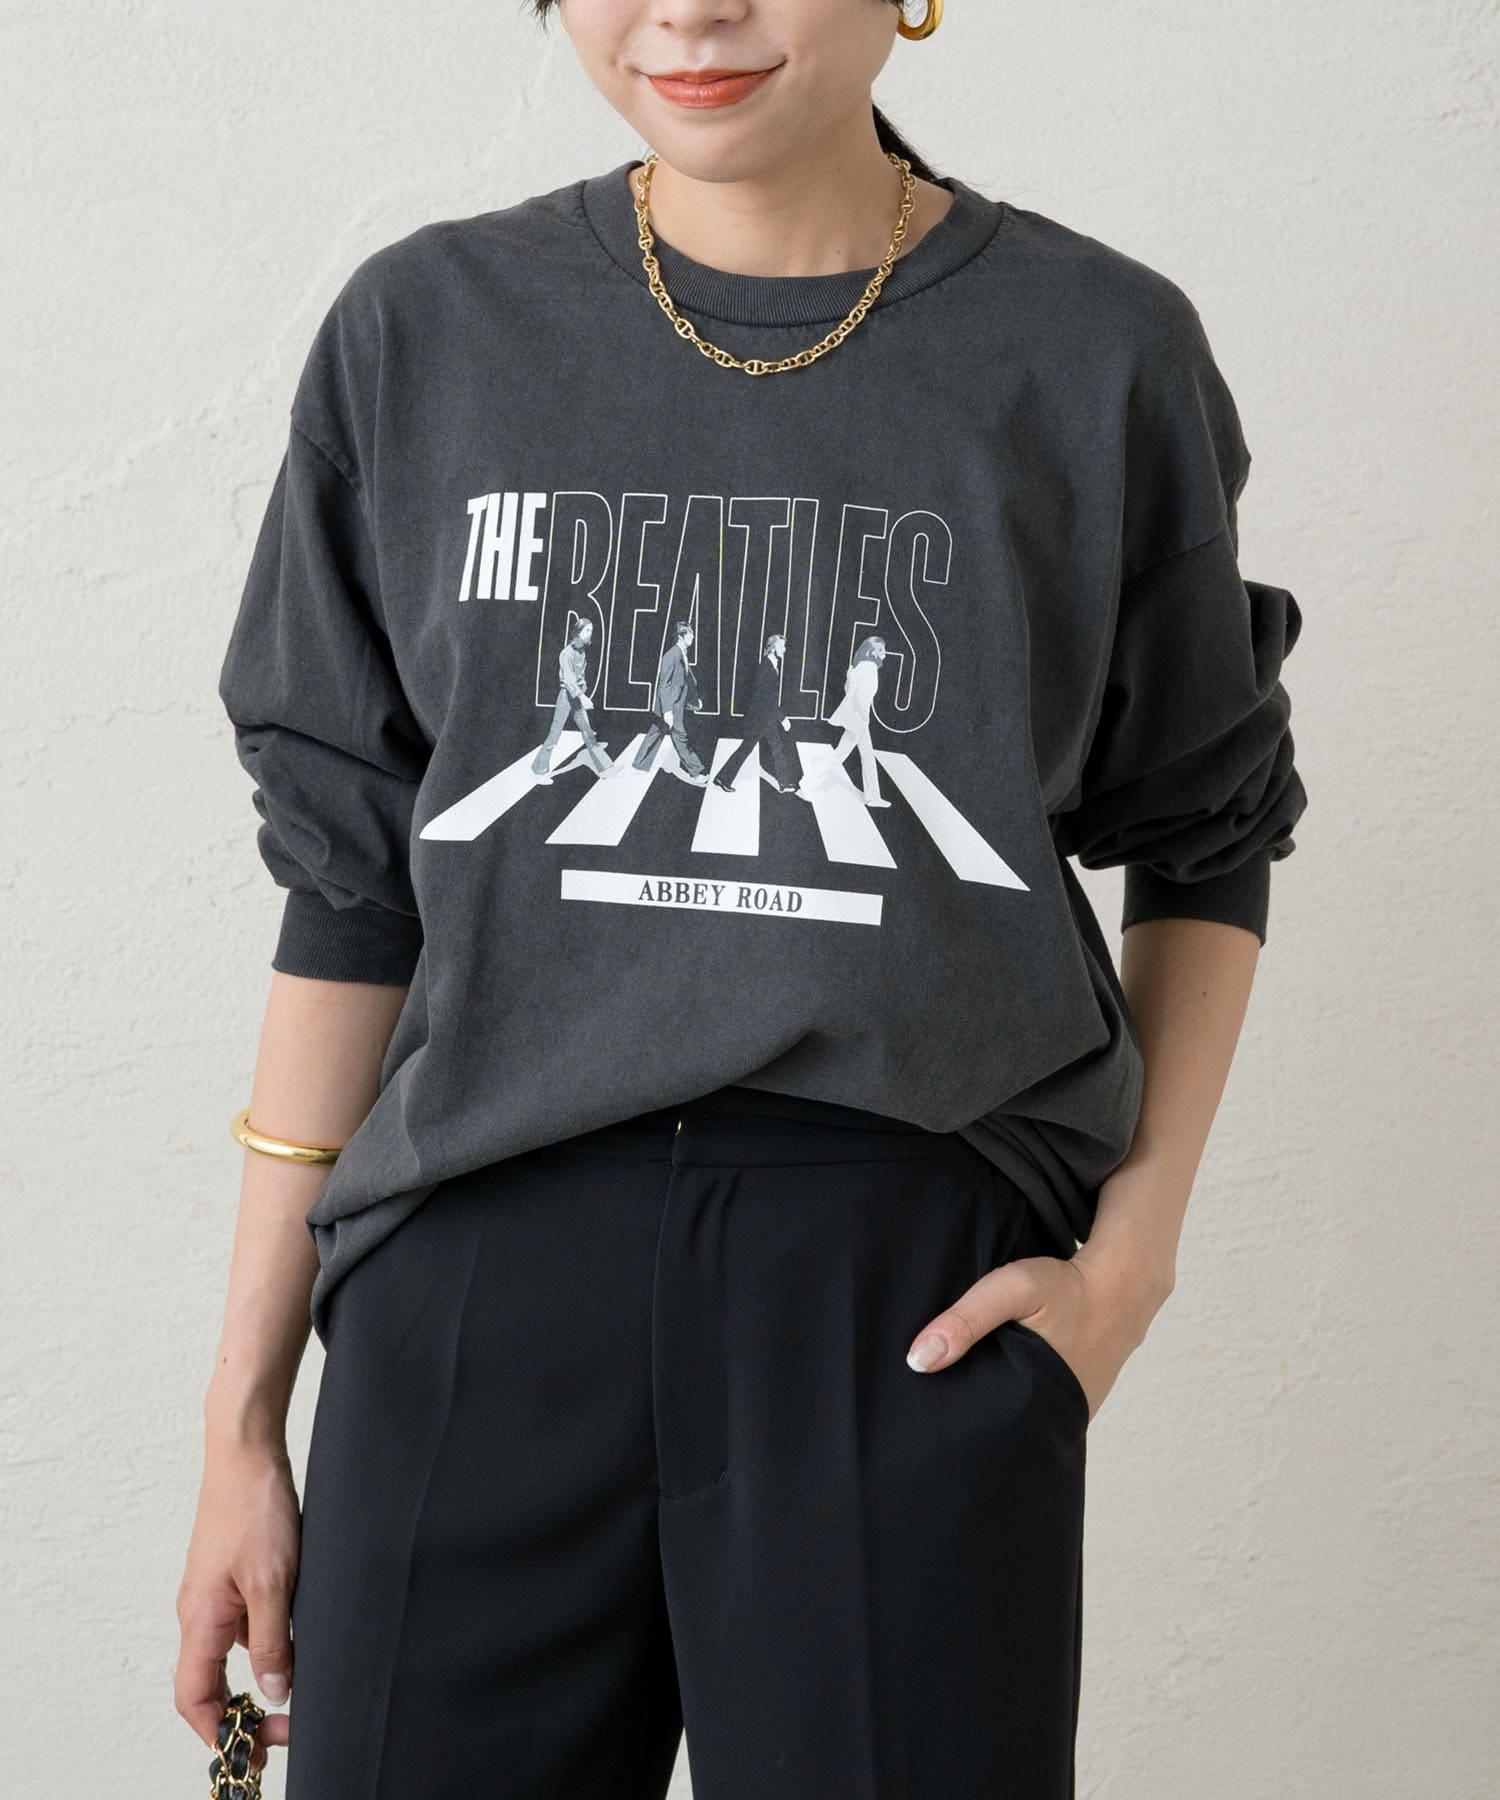 Loungedress(ラウンジドレス) 【GOOD ROCK SPEED/グッドロックスピード】BEATLES Tシャツ